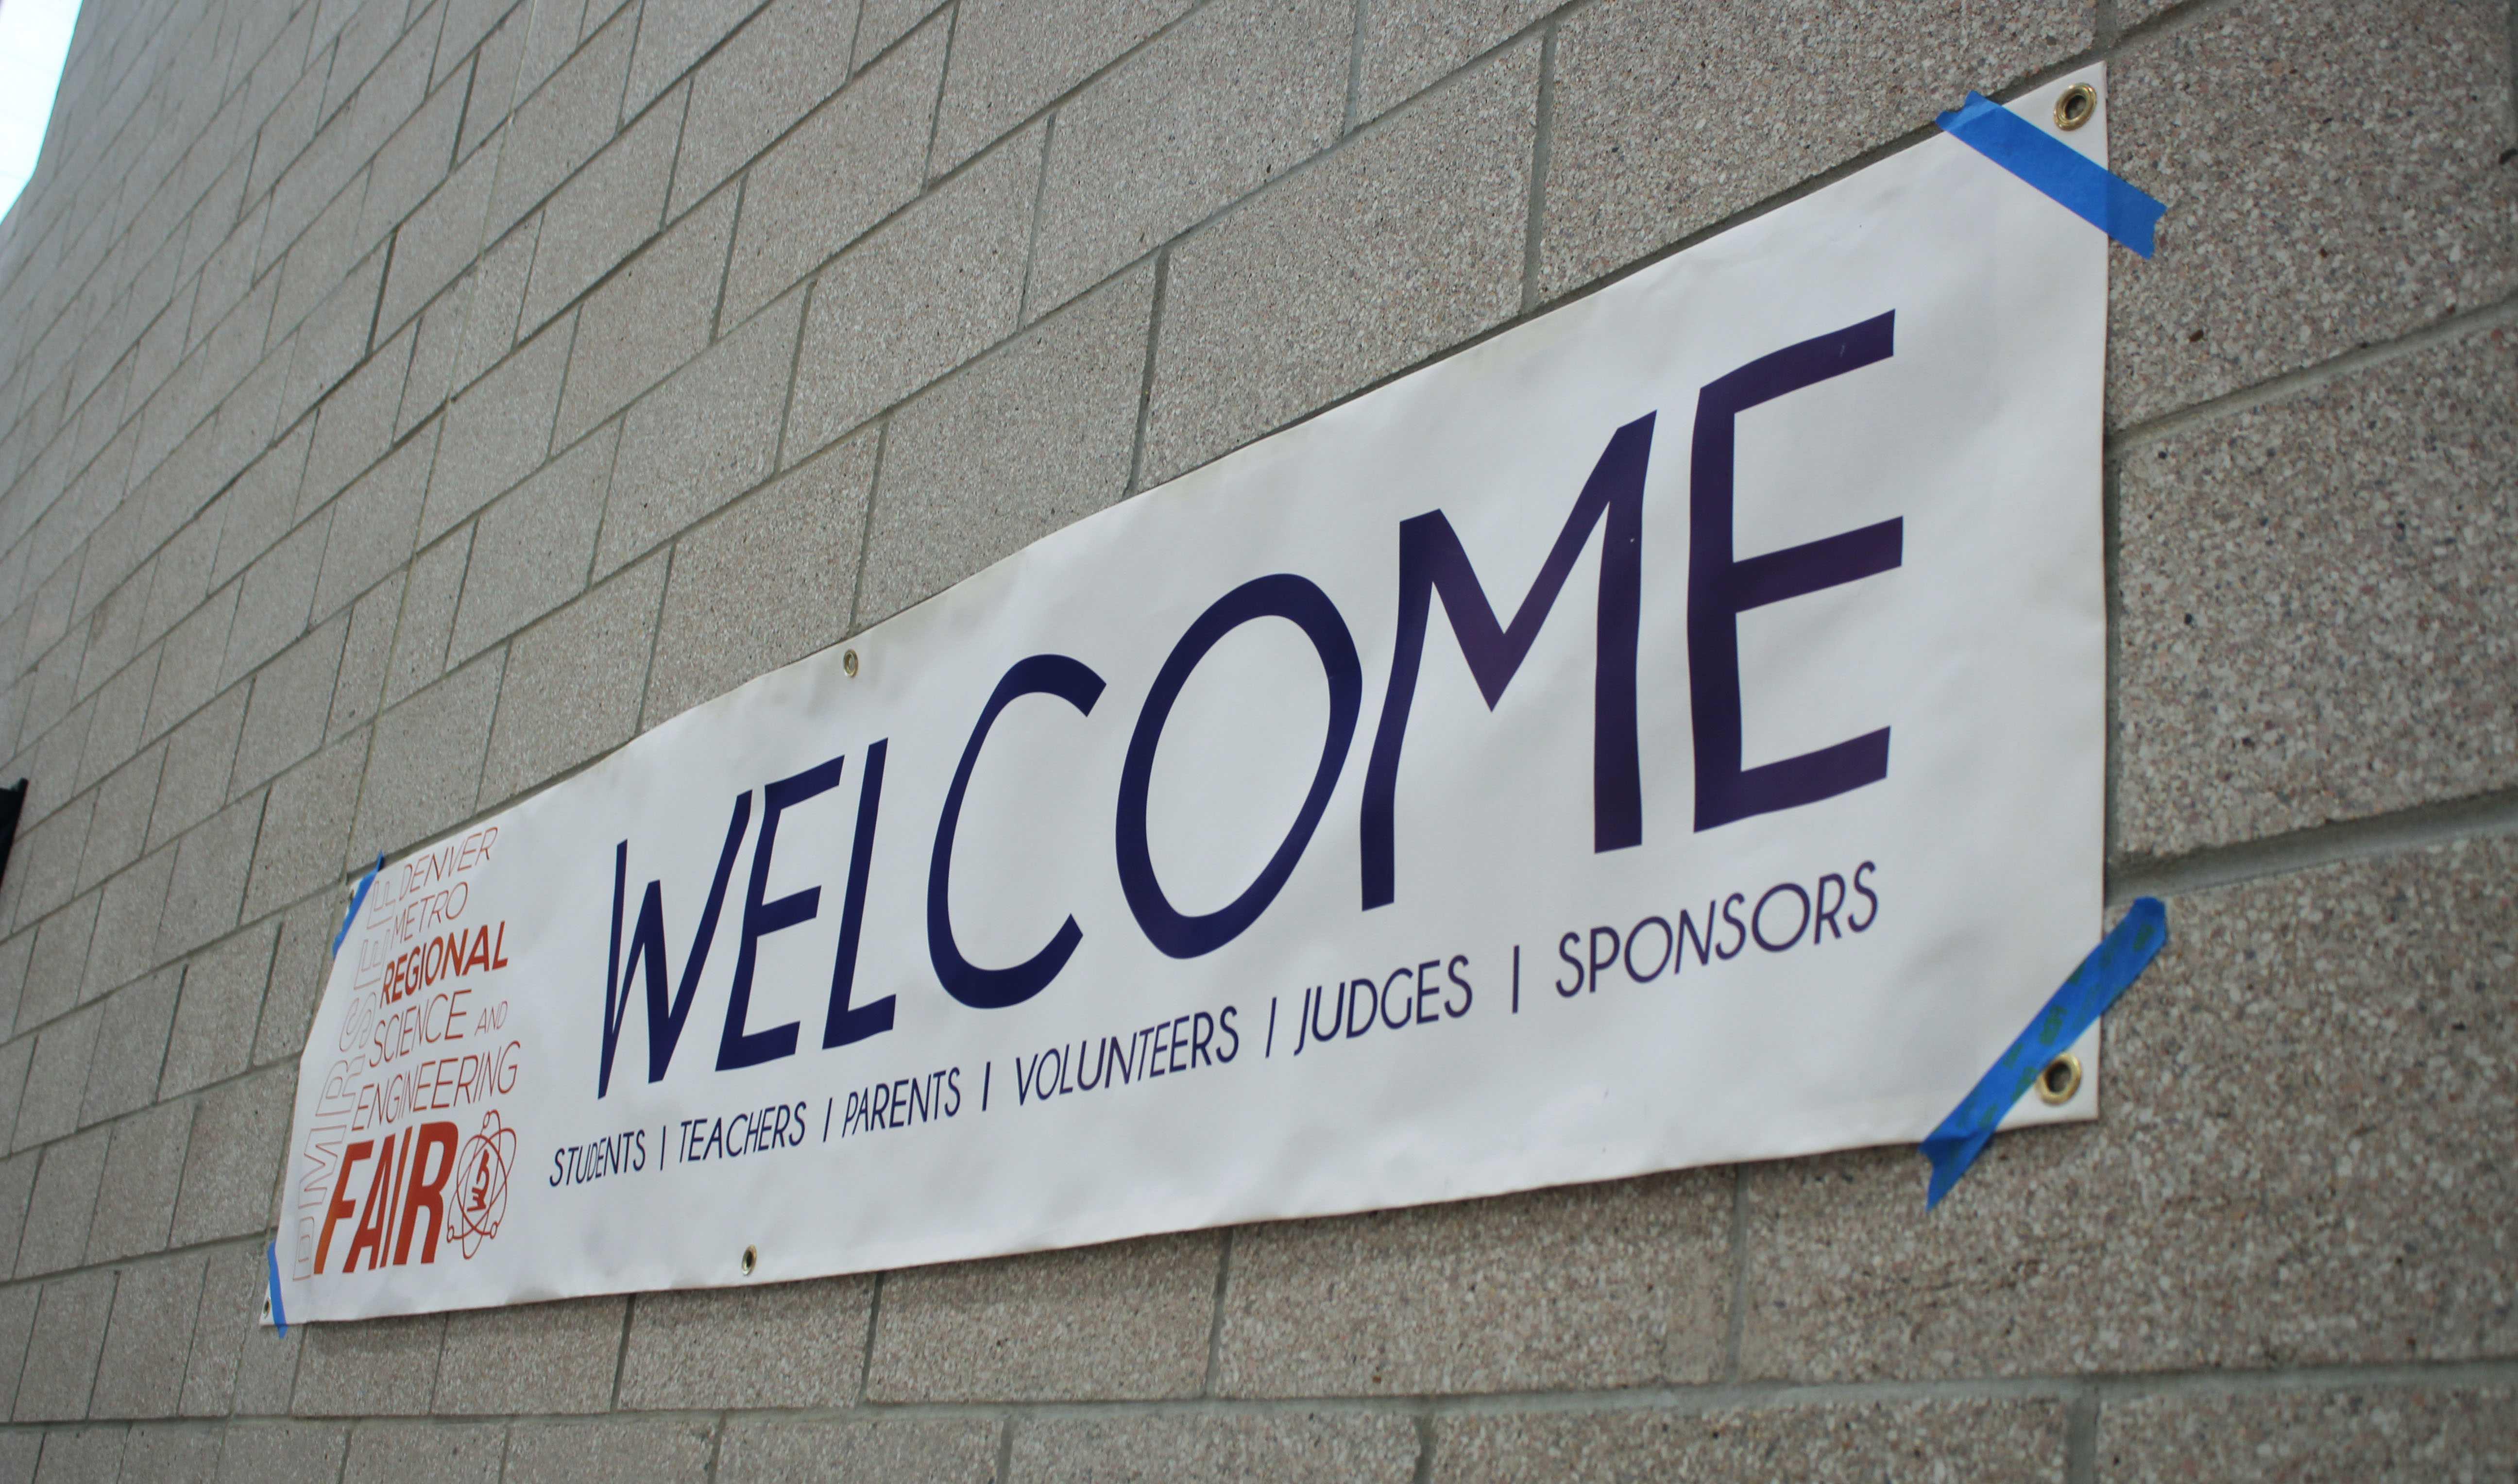 The Denver Metro Regional Science and Engineering Fair